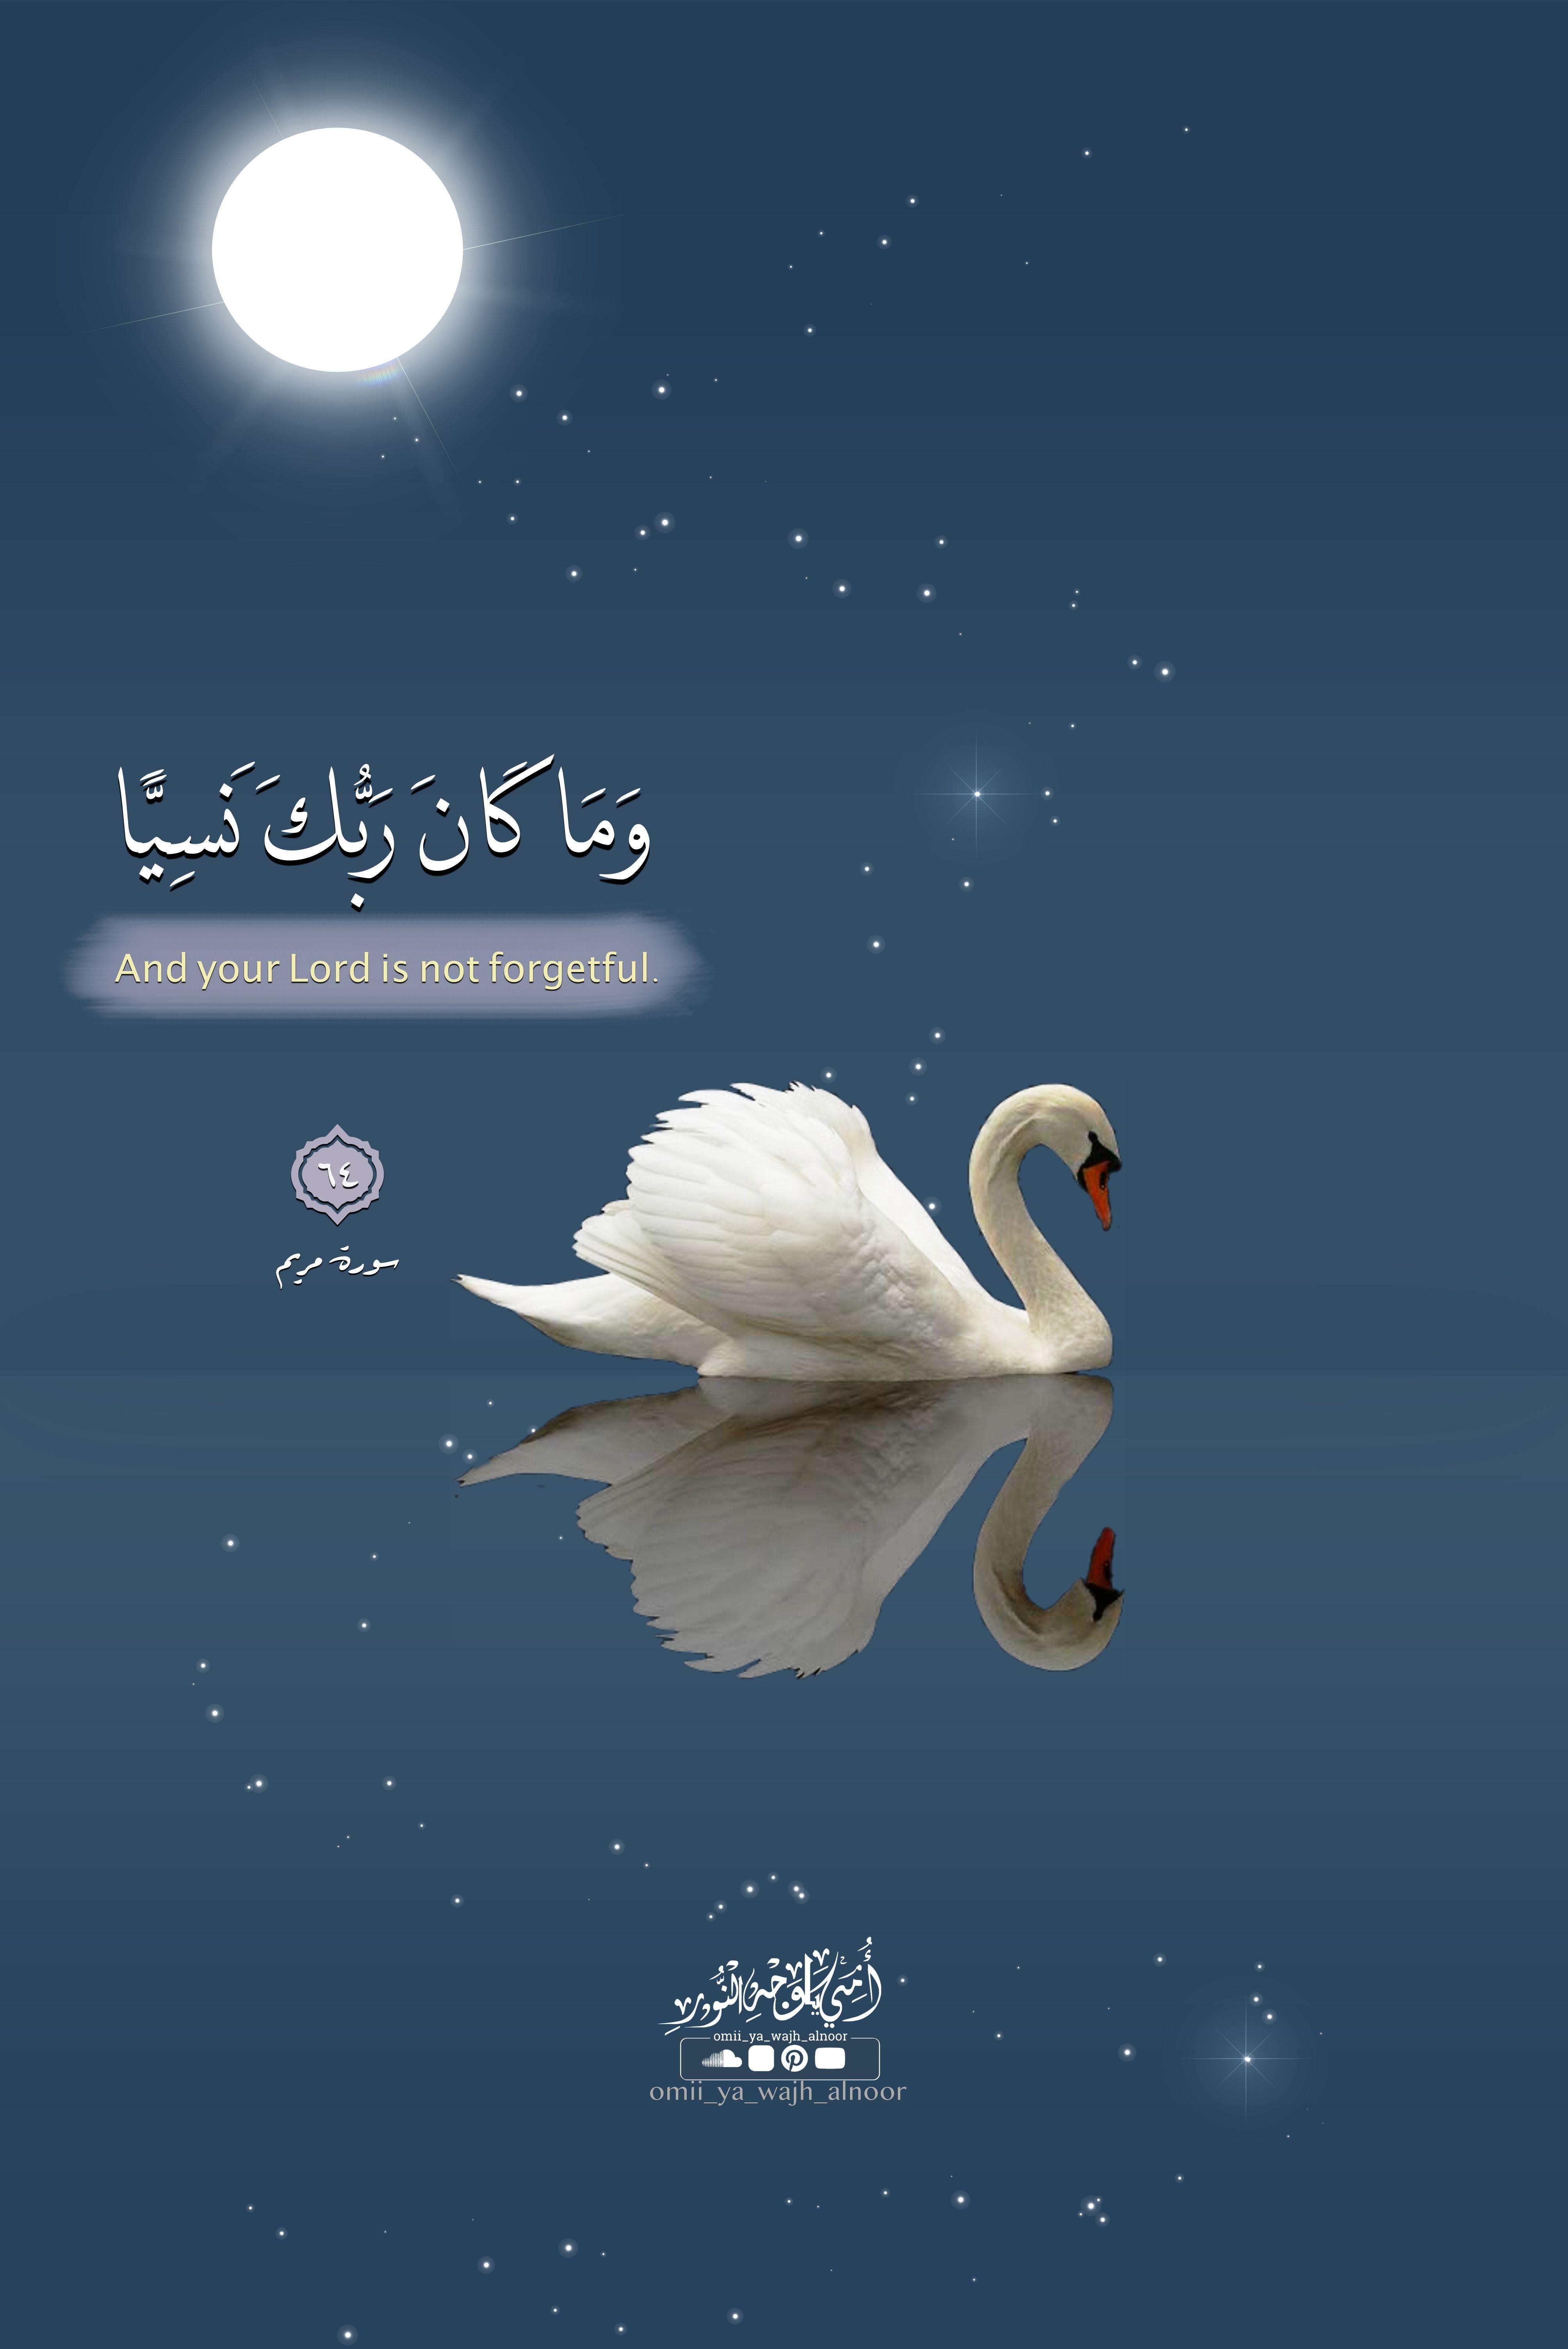 وما كان ربك نسيا Islamic Pictures Arabic Art Wedding Frames